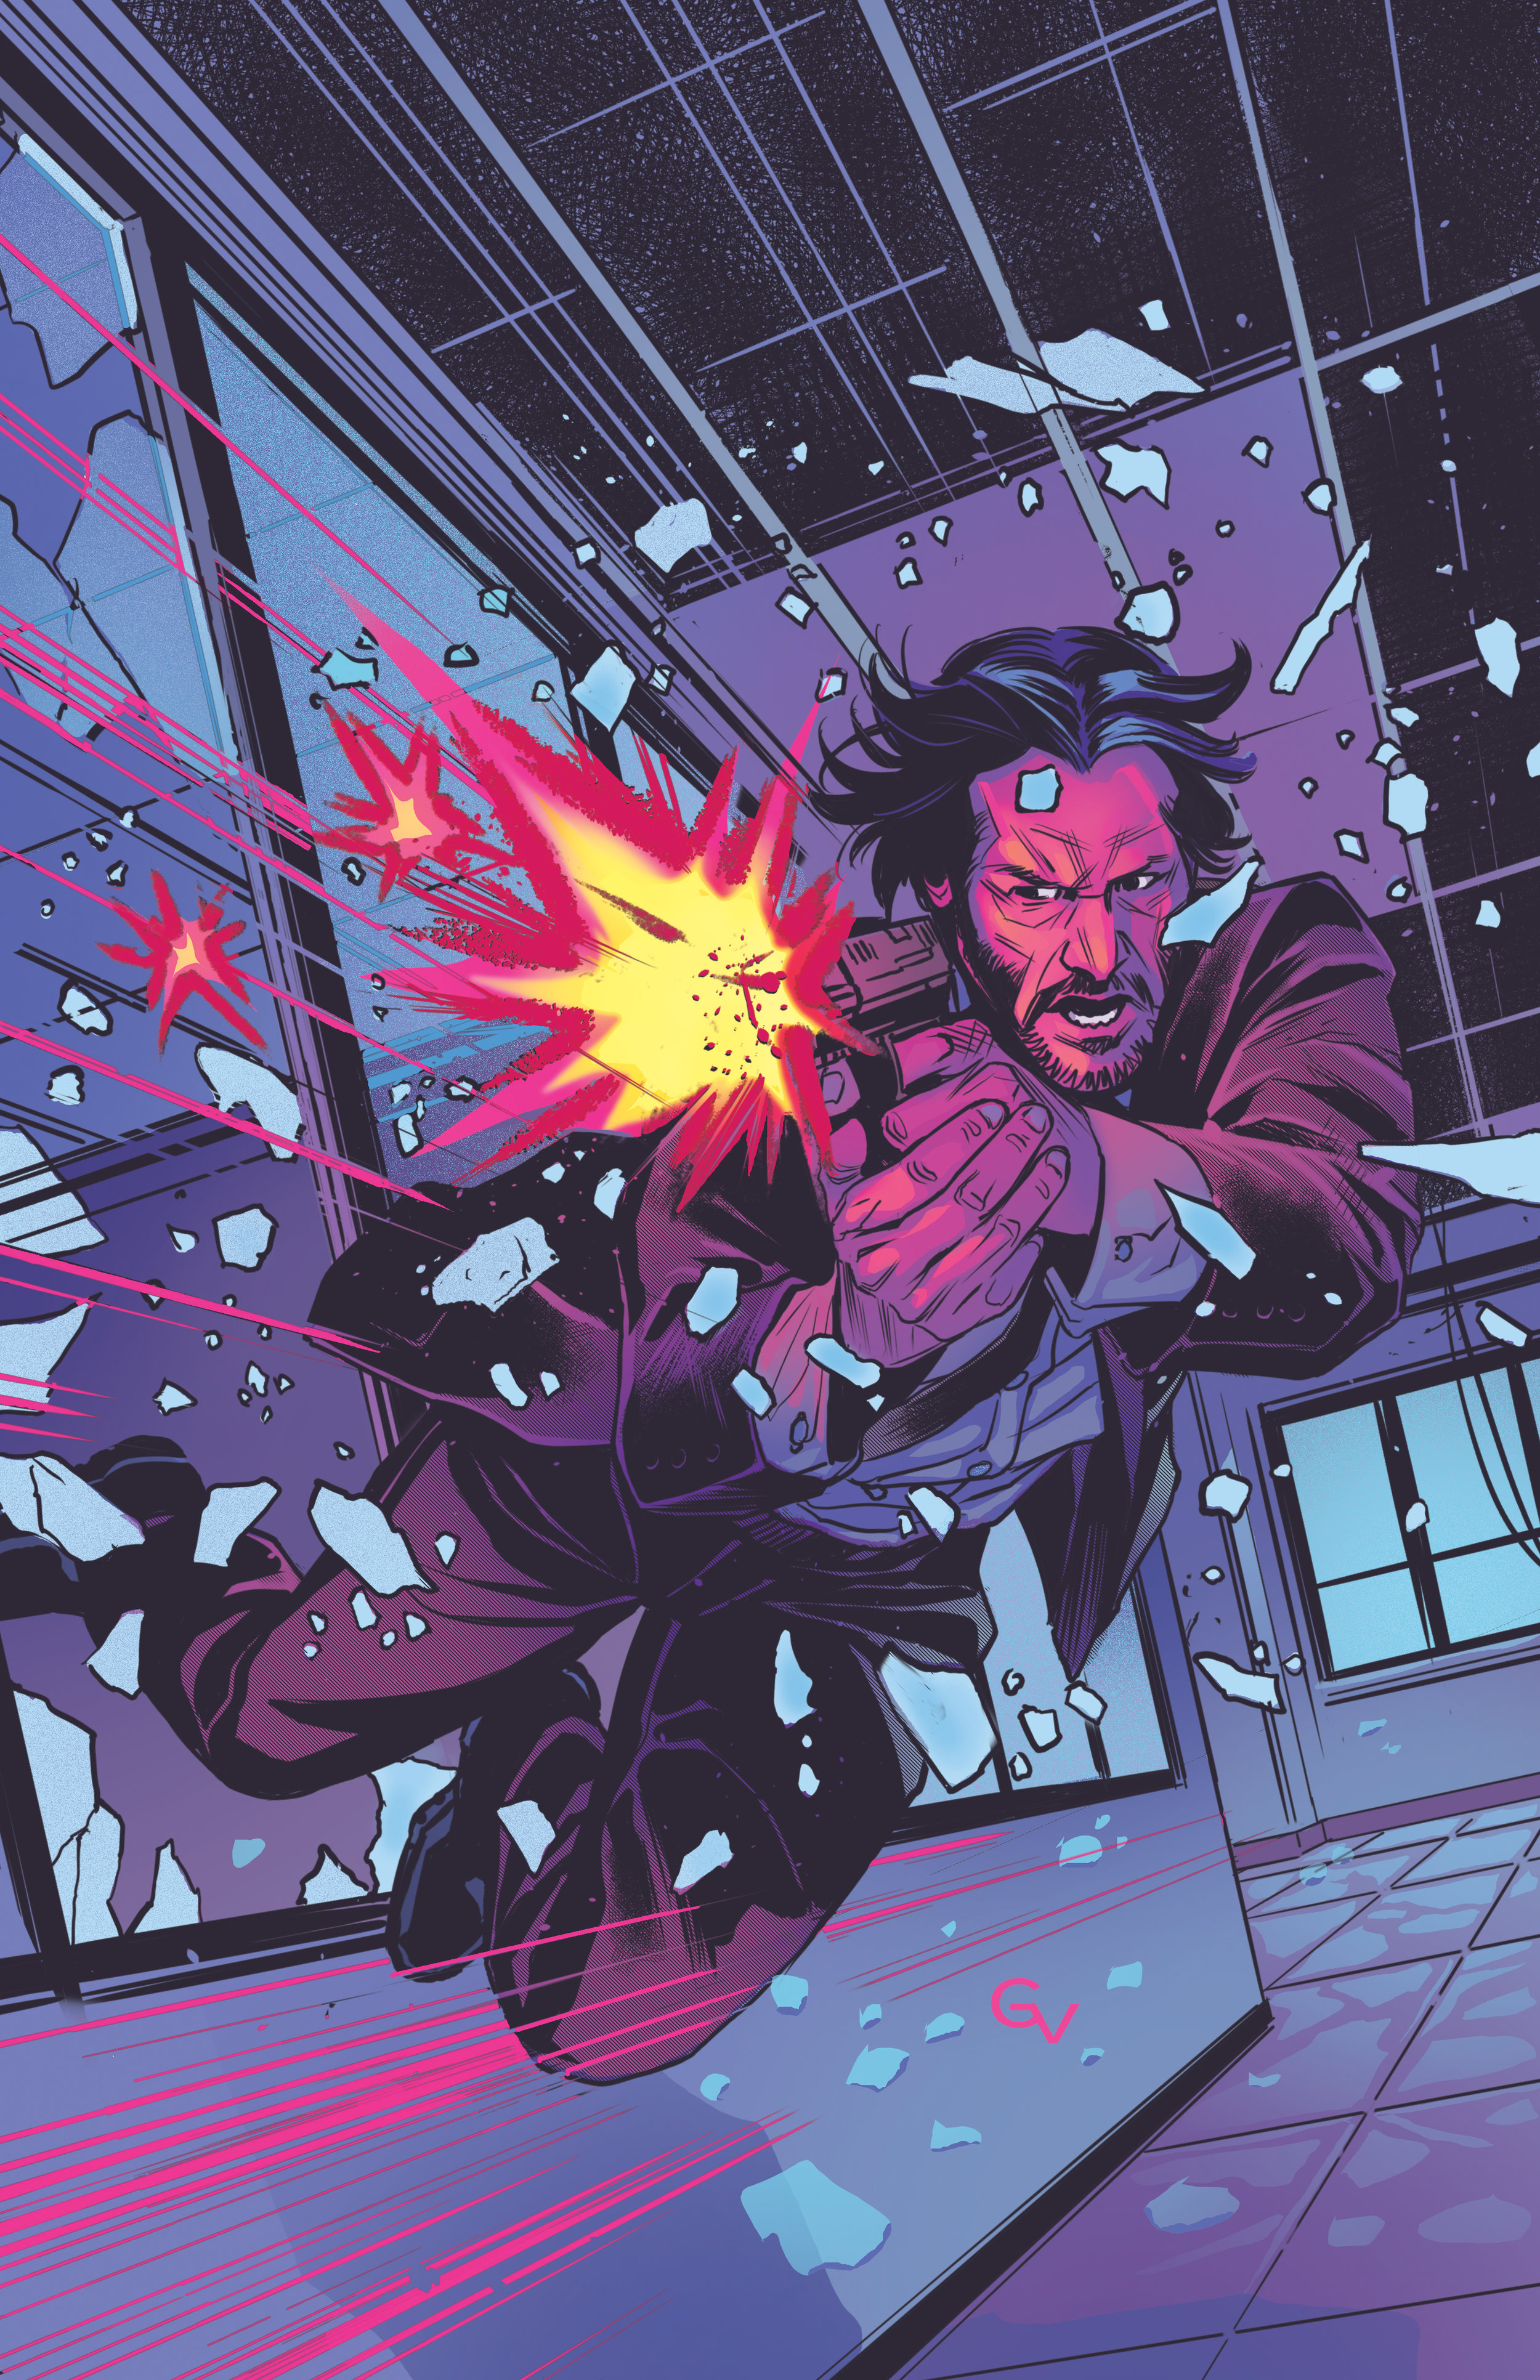 John Wick cover 4 colors.jpg